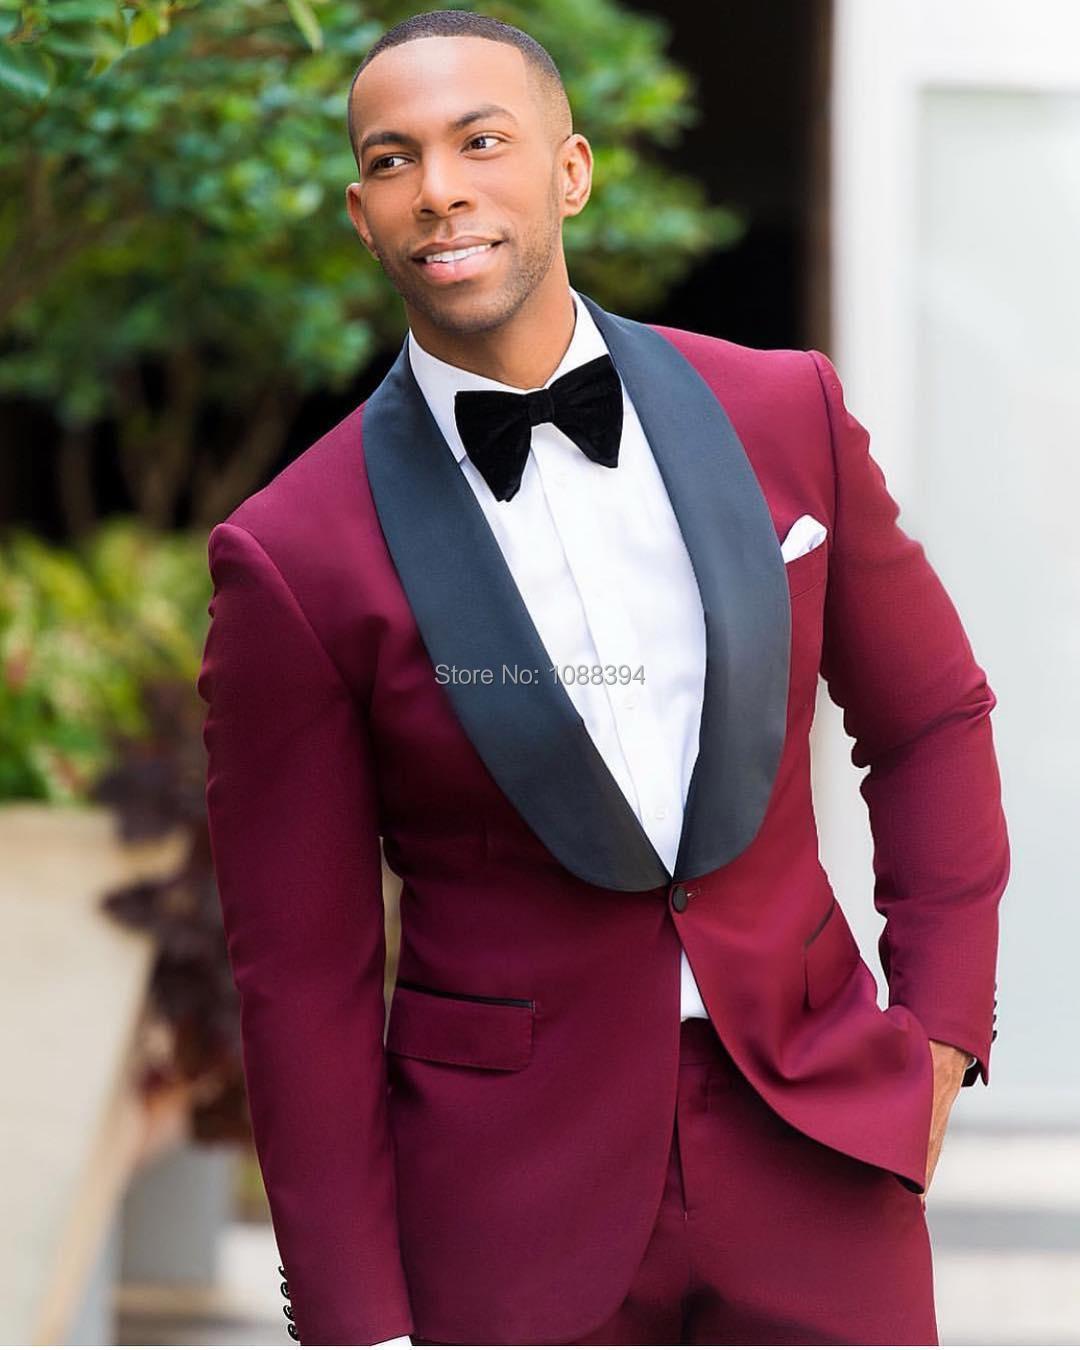 2019 Men Suits With Pants Burgundy Groom Wear Tuxedos 2 Piece Set Wedding Suits Groomsmen Best Man Formal Business Suit For Men